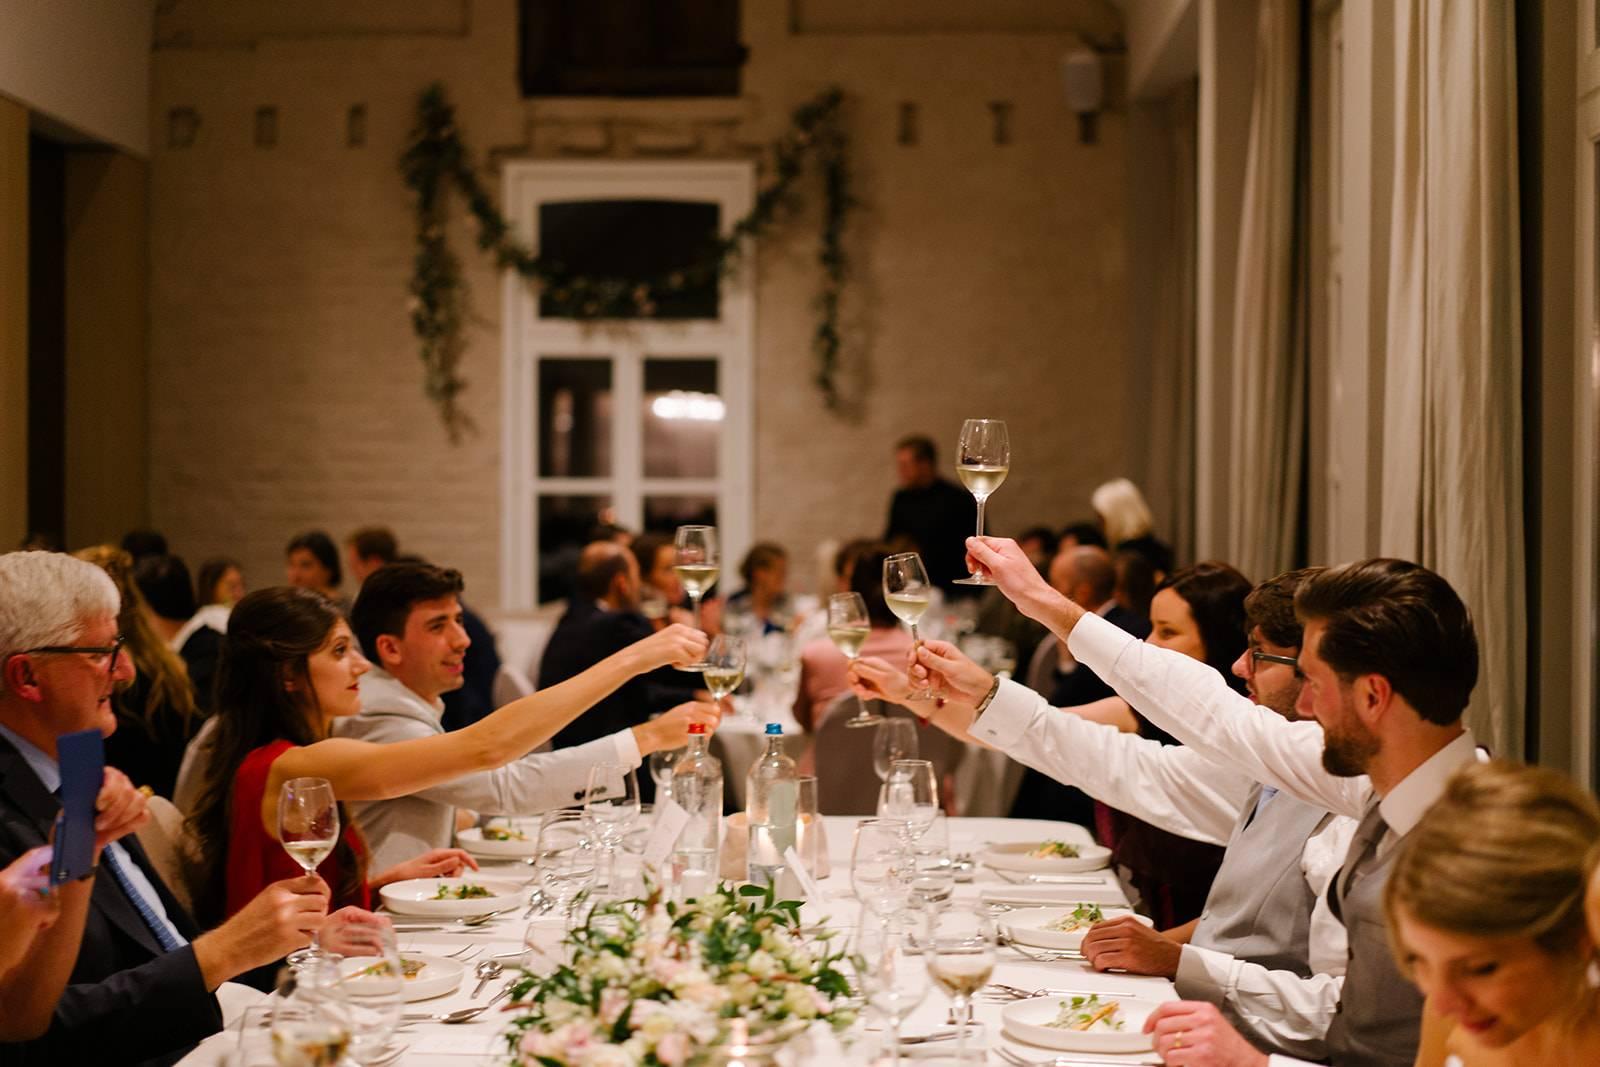 Hilde Eyckmans - AB-865 - House of Weddings